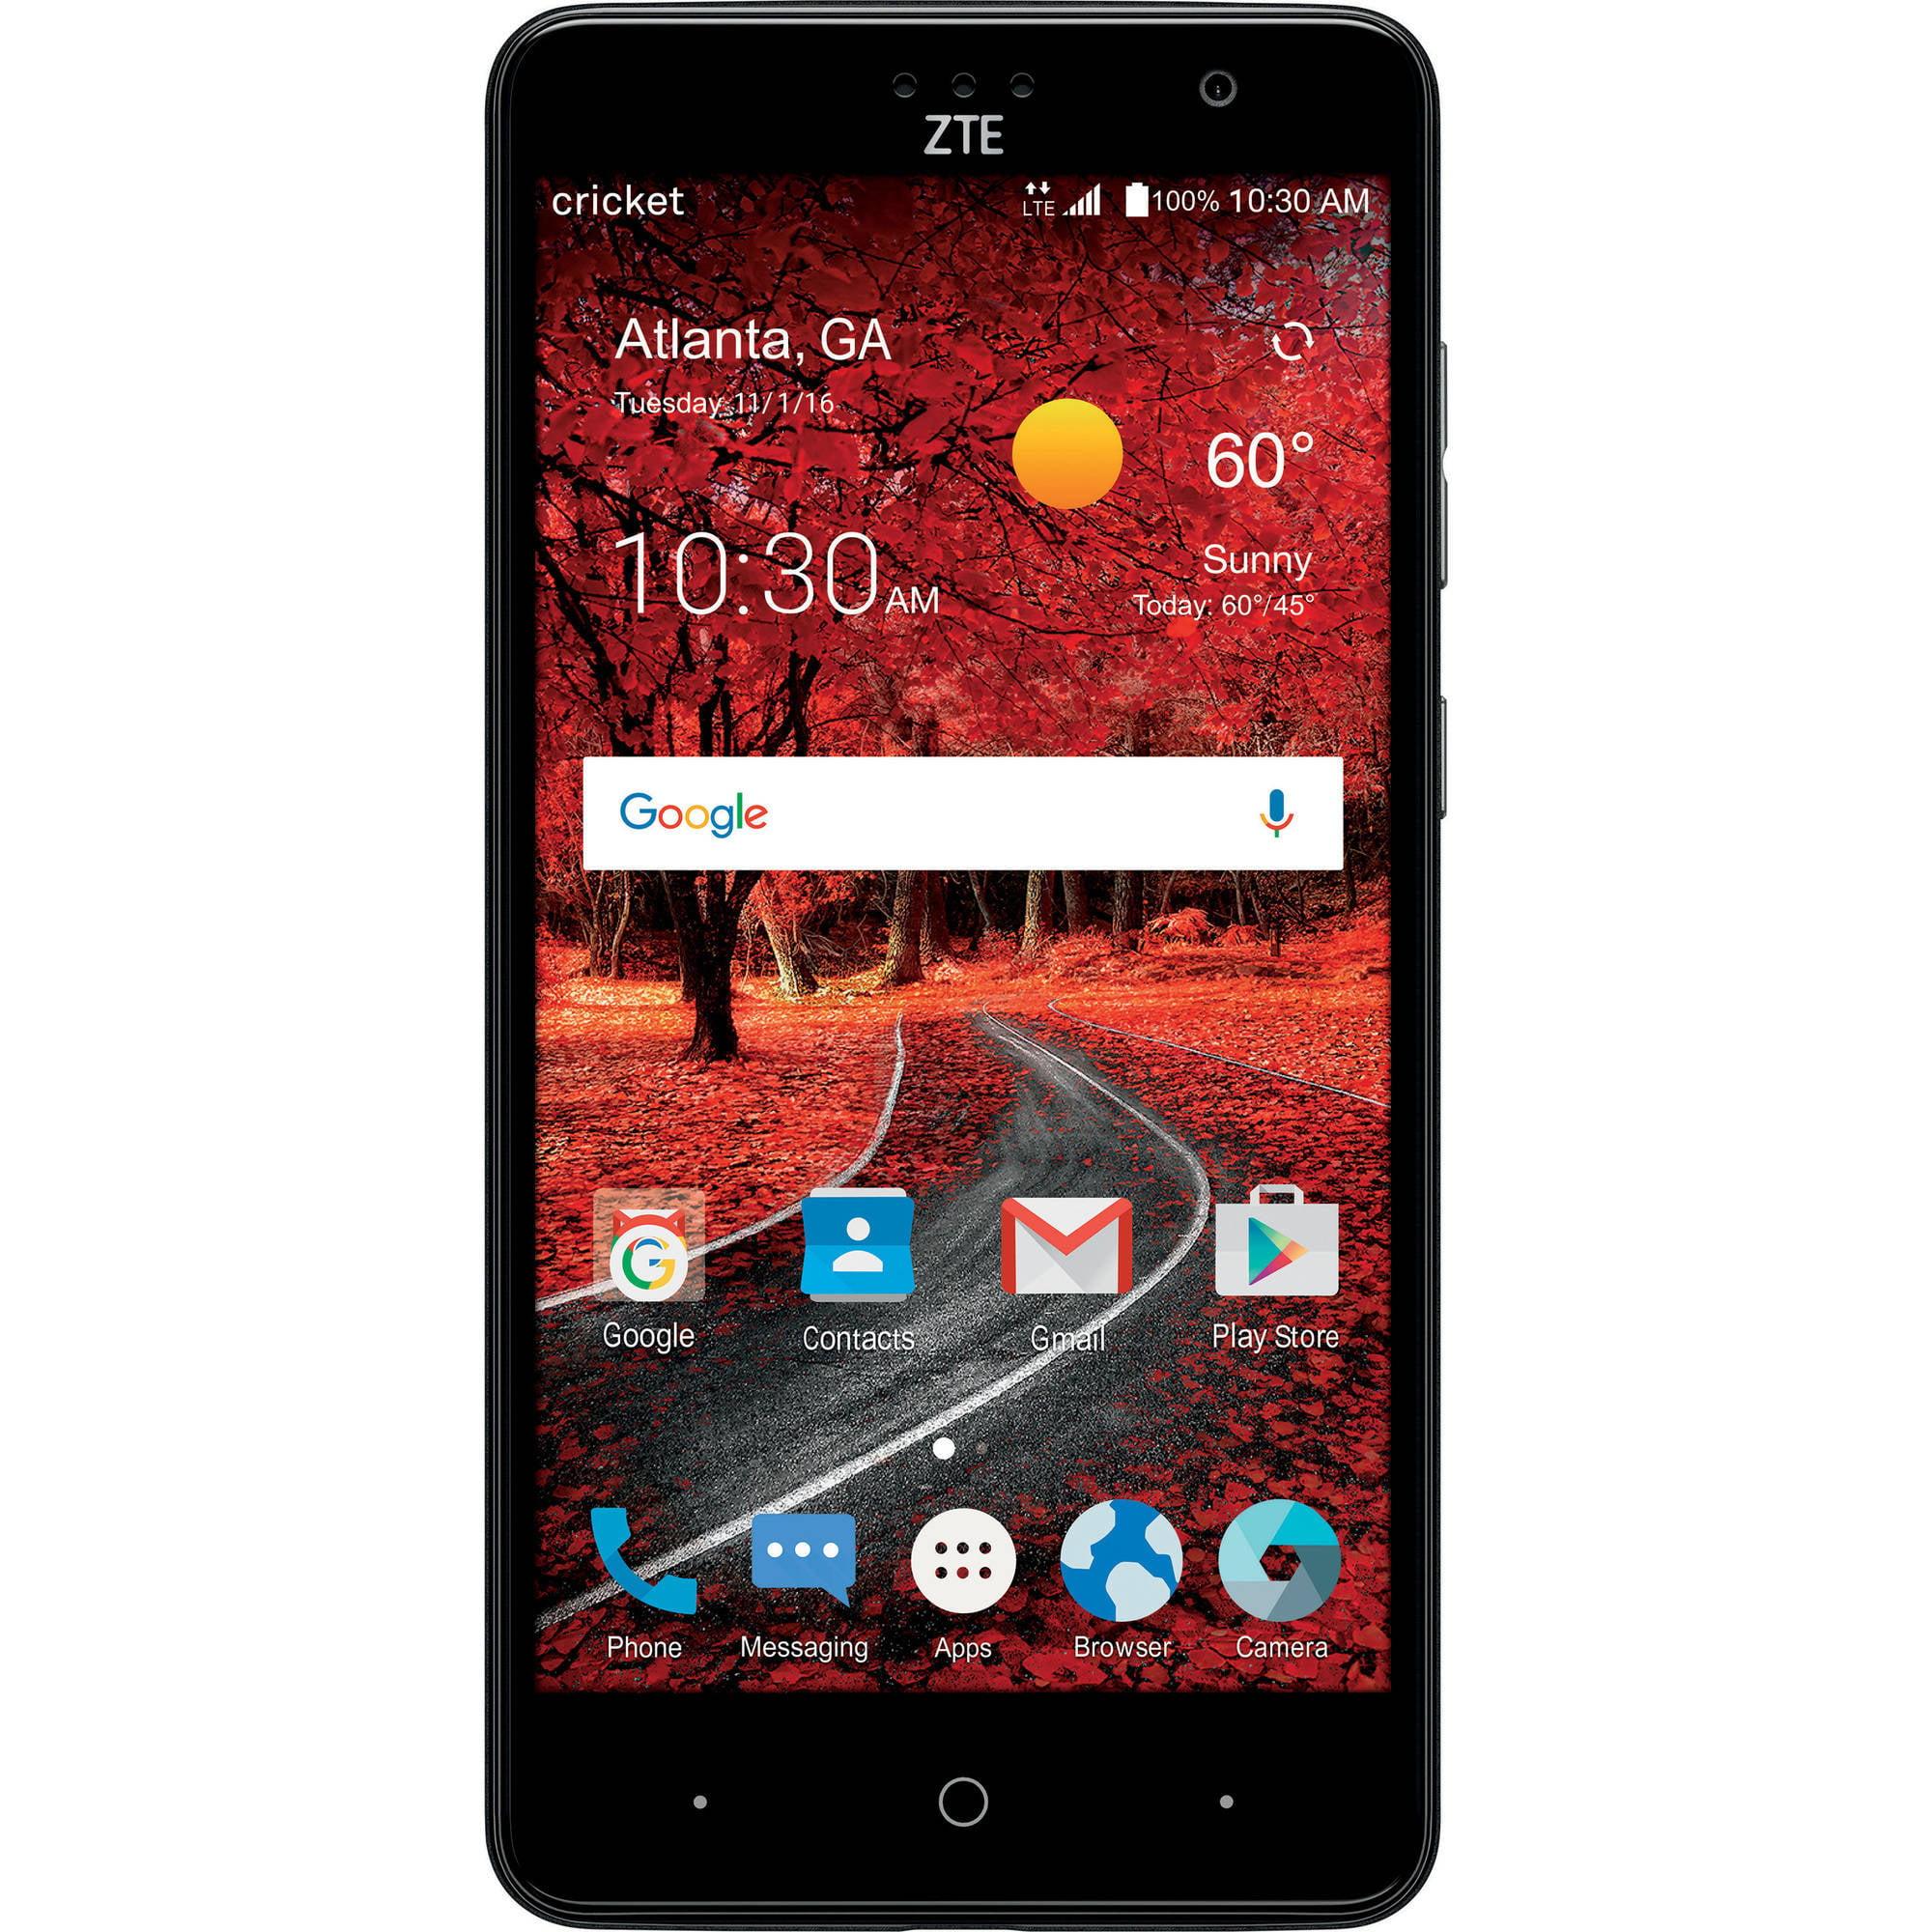 Prepaid telecom operator virgin mobile usa will soon start selling - Cricket Wireless Zte Grand X4 16gb Prepaid Smartphone Gray